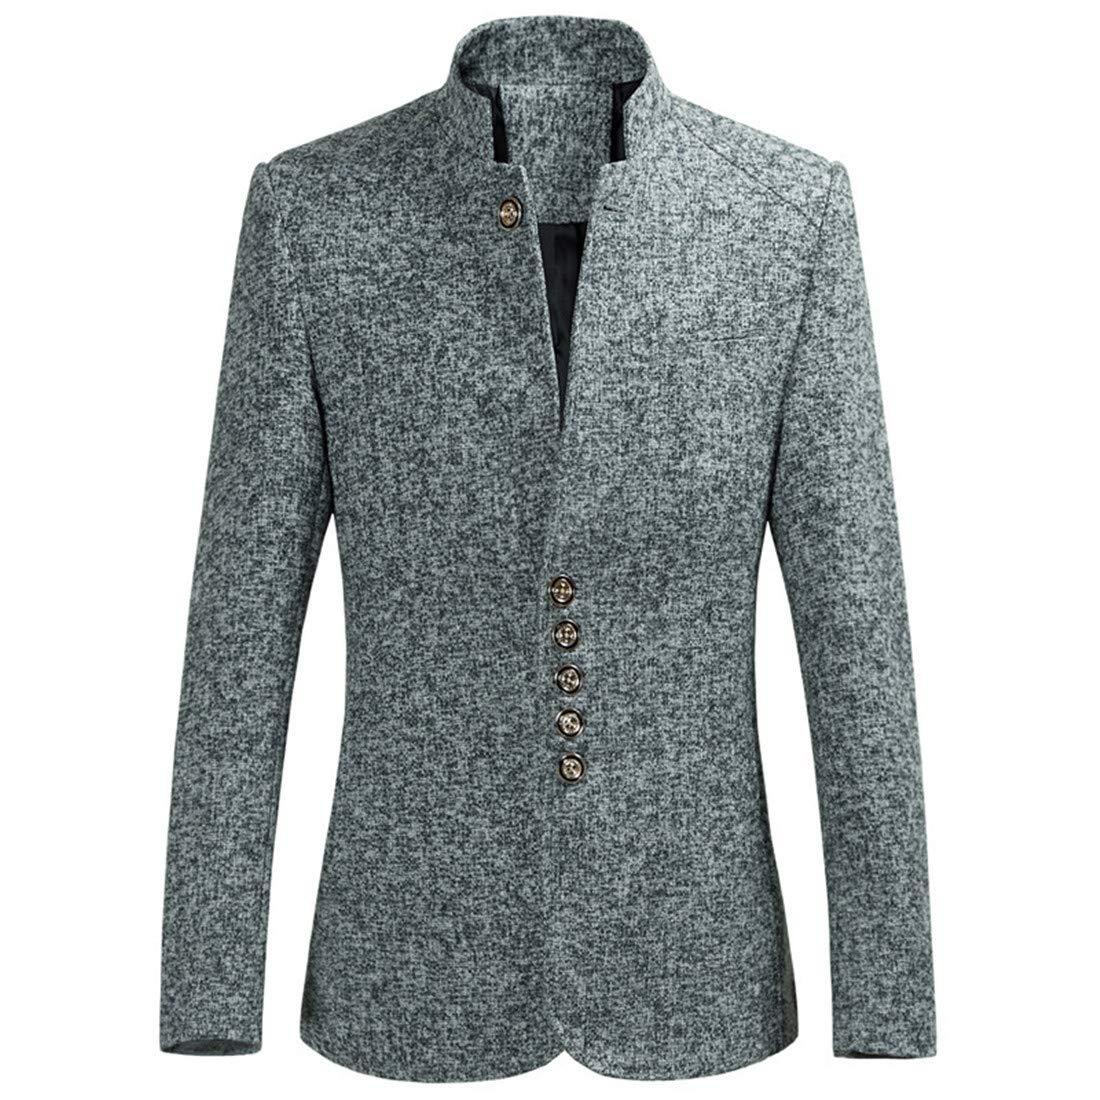 CAI&HONG-GUO GGG Herrenanzug Anzug, Herrenkragen, Anzug, Mantel